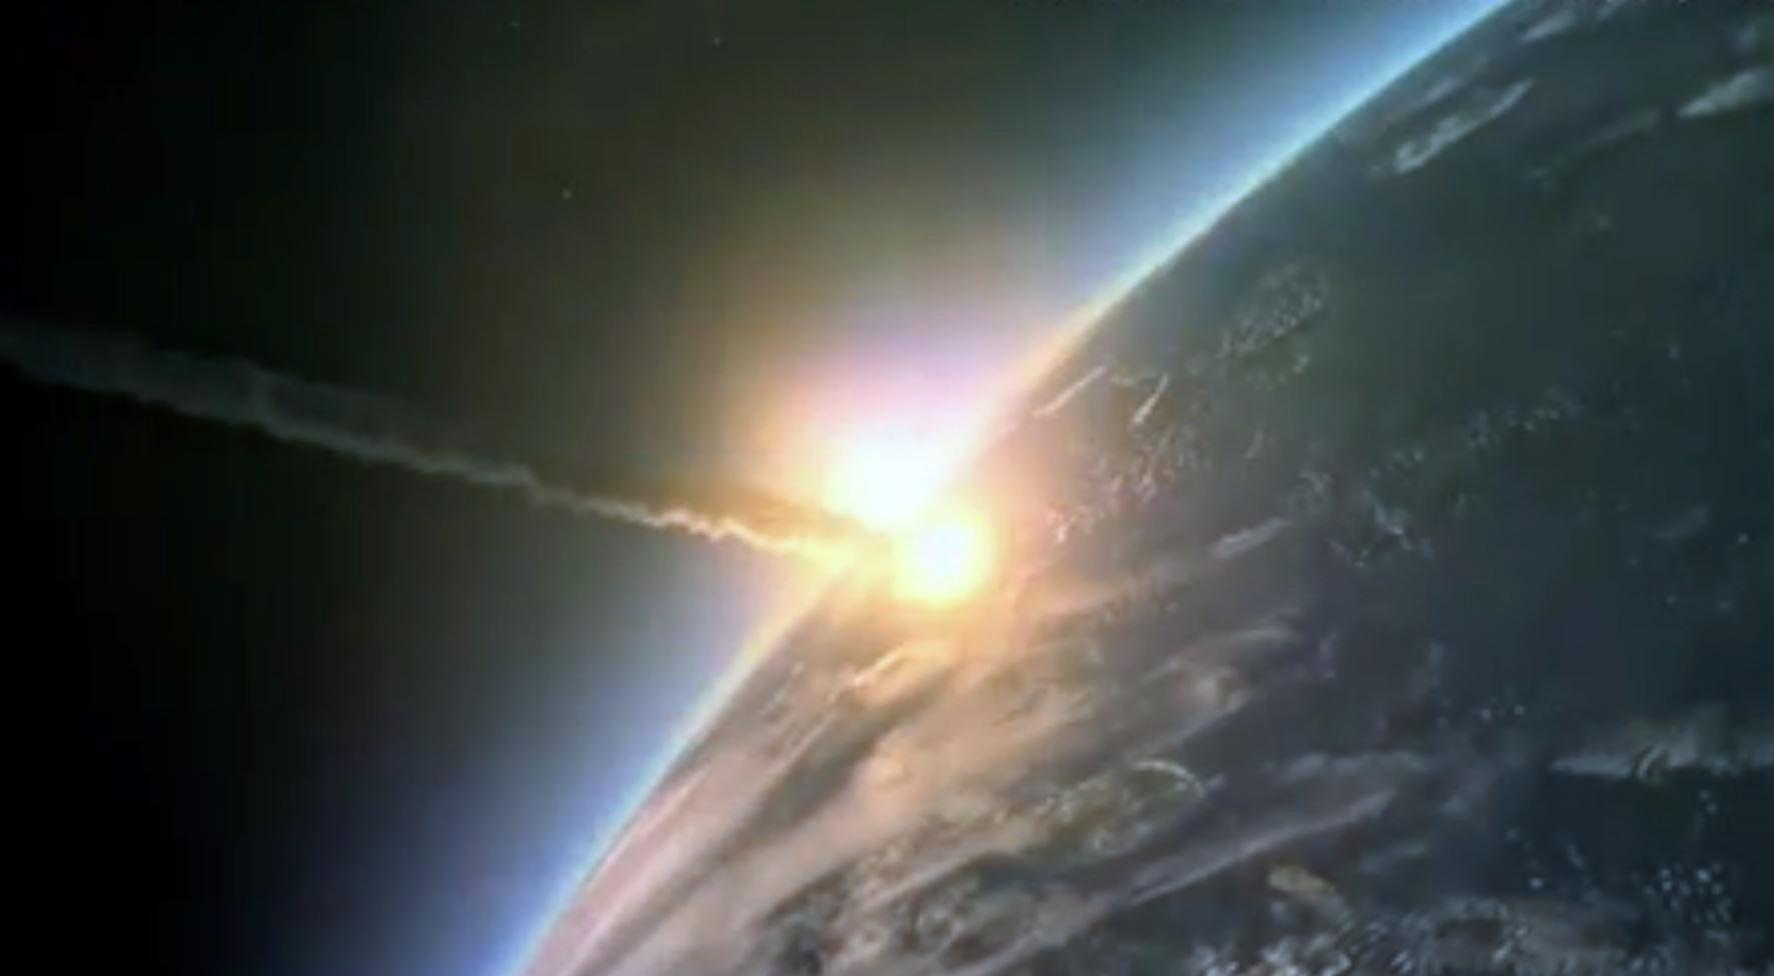 eksplozija-dinosauri-2